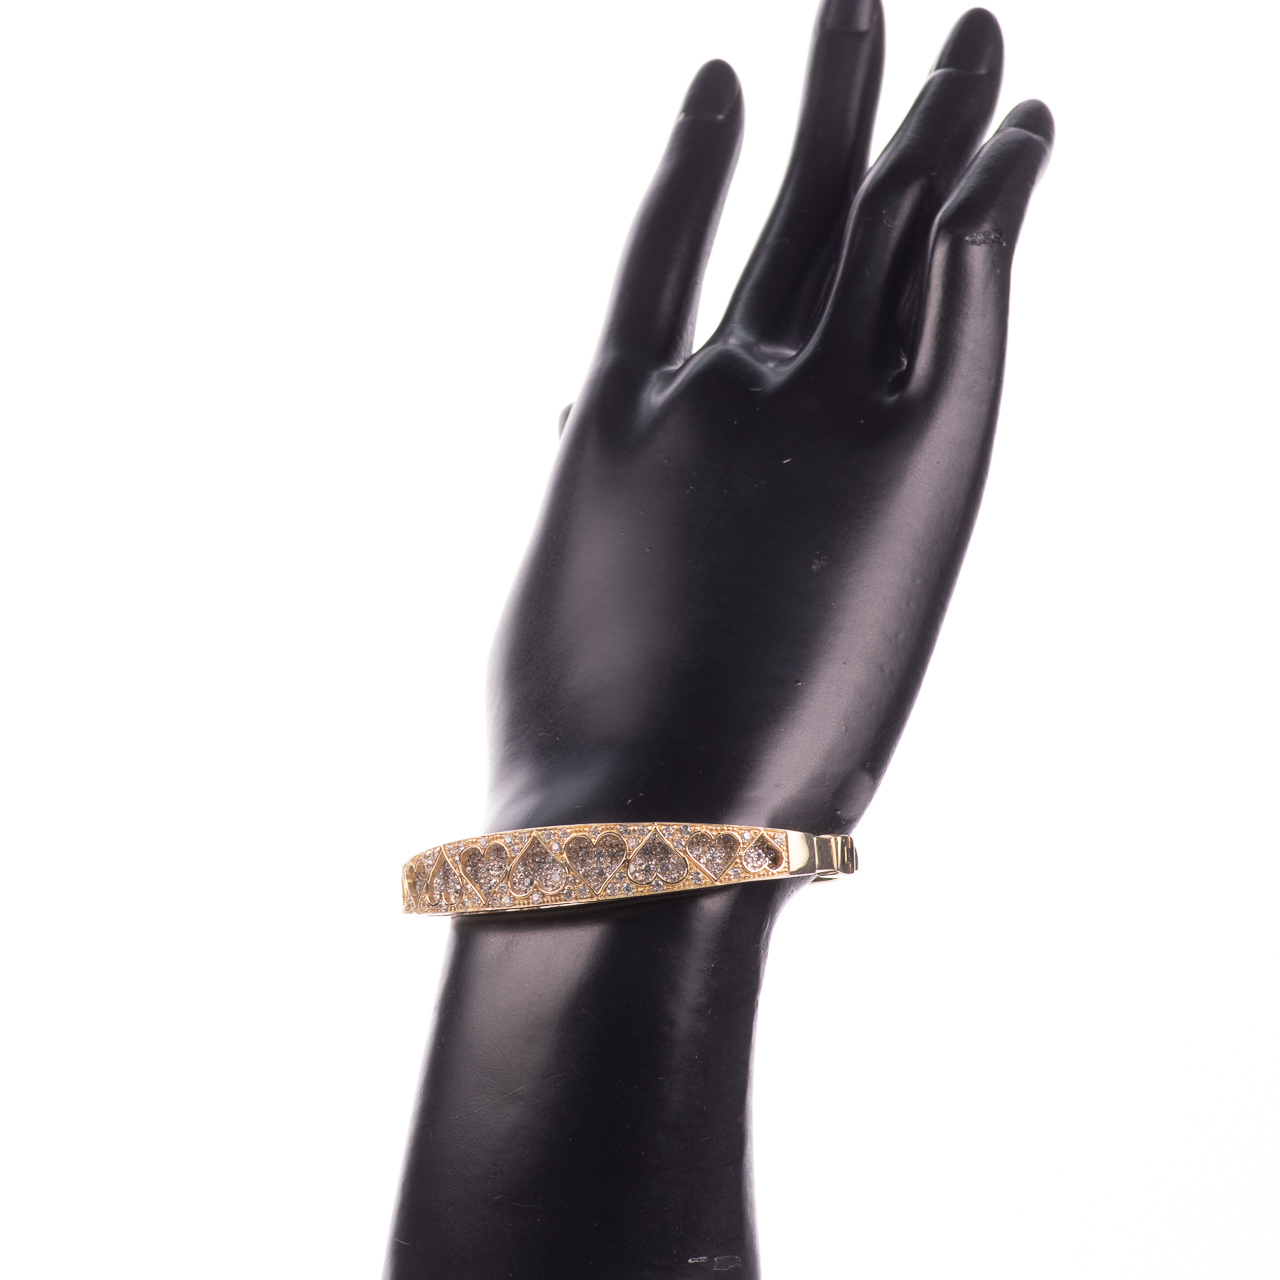 9ct Gold 4ct Diamond Heart Bangle Bracelet - Image 2 of 7